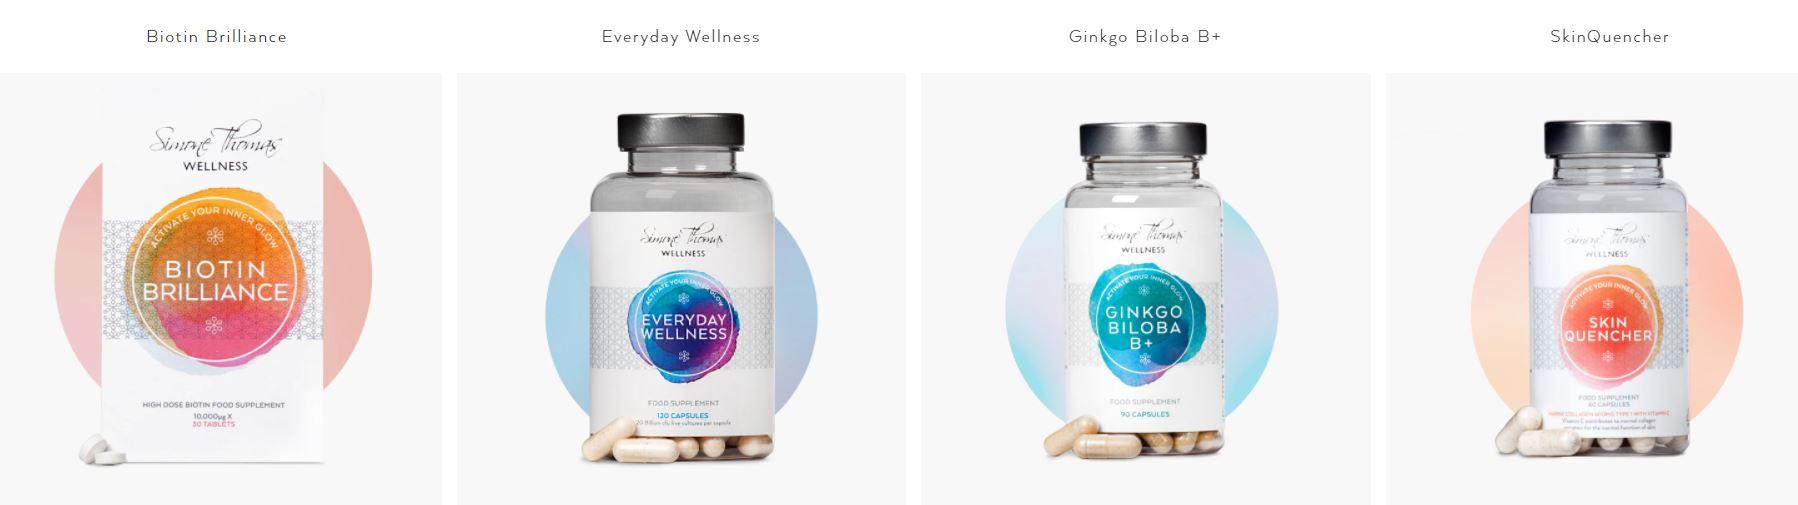 Simone Thomas Wellness products